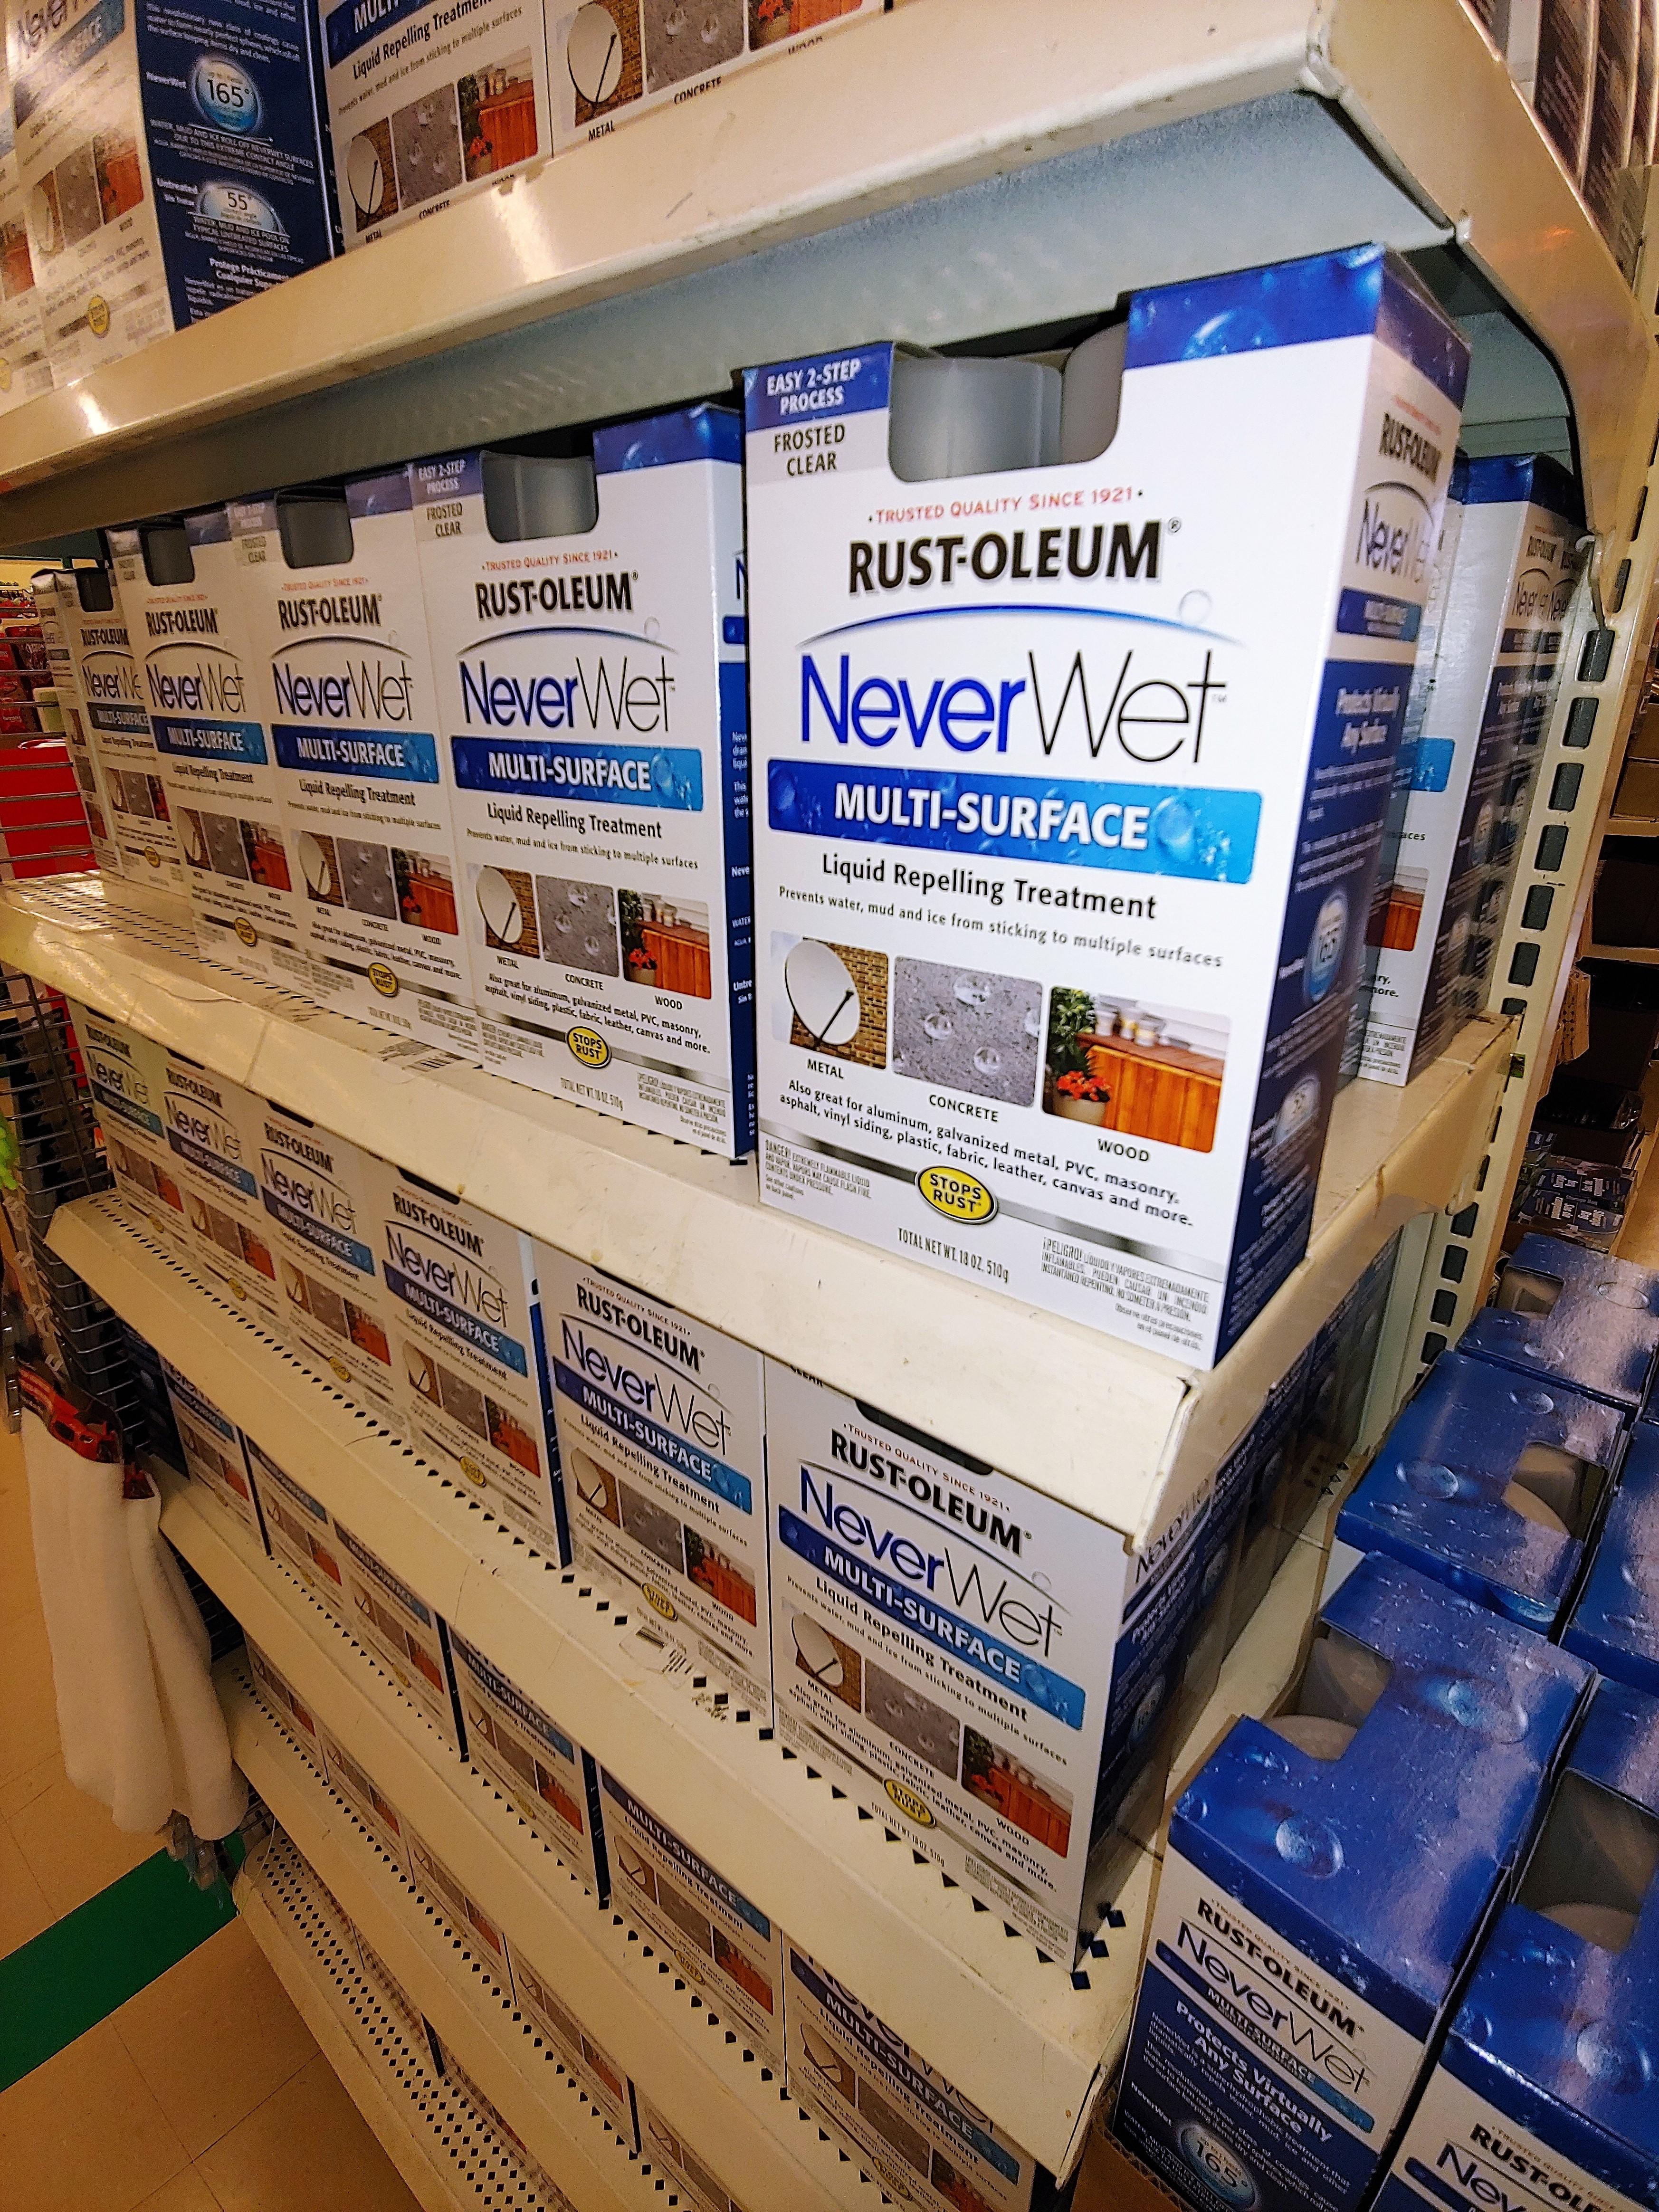 Rustoleum NeverWet 2-Step Liquid Repelling Treatment $1 at Dollar Tree